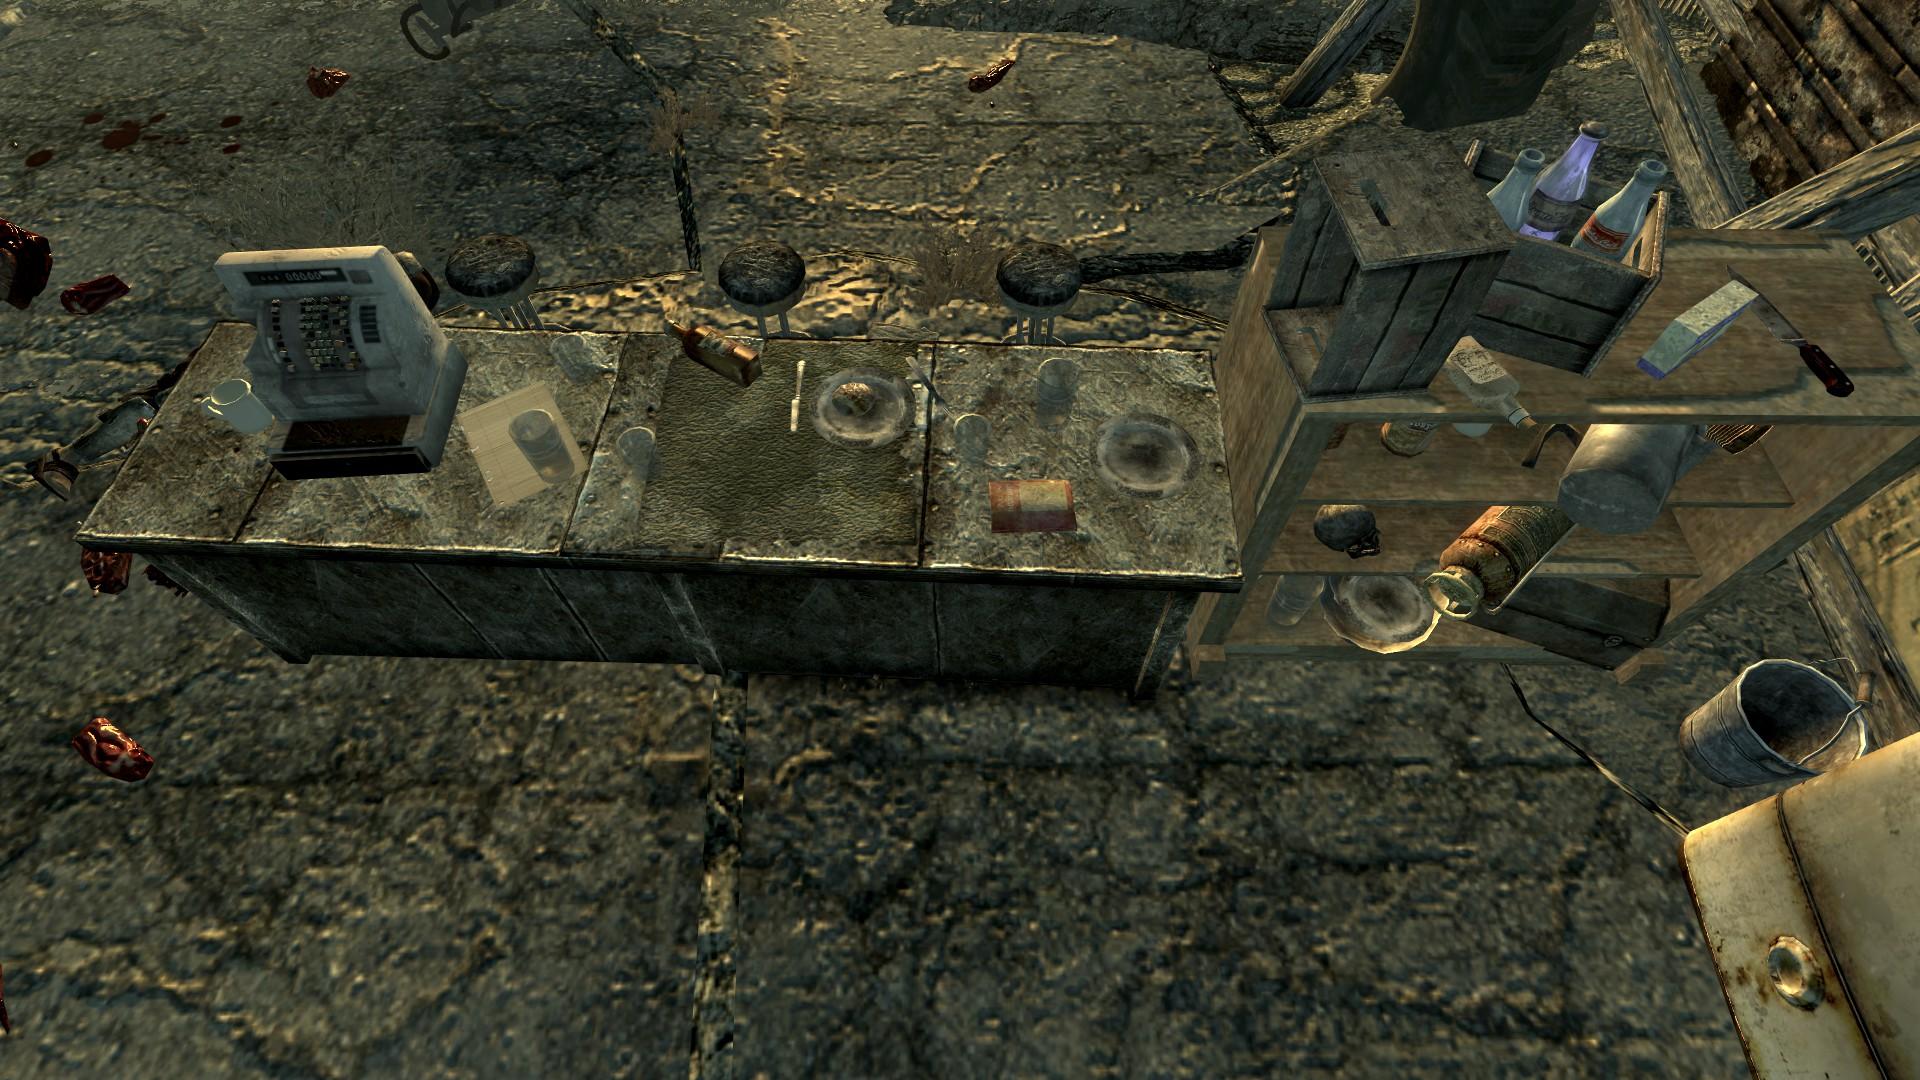 FO3 PI Flooded Metro Raider Camp